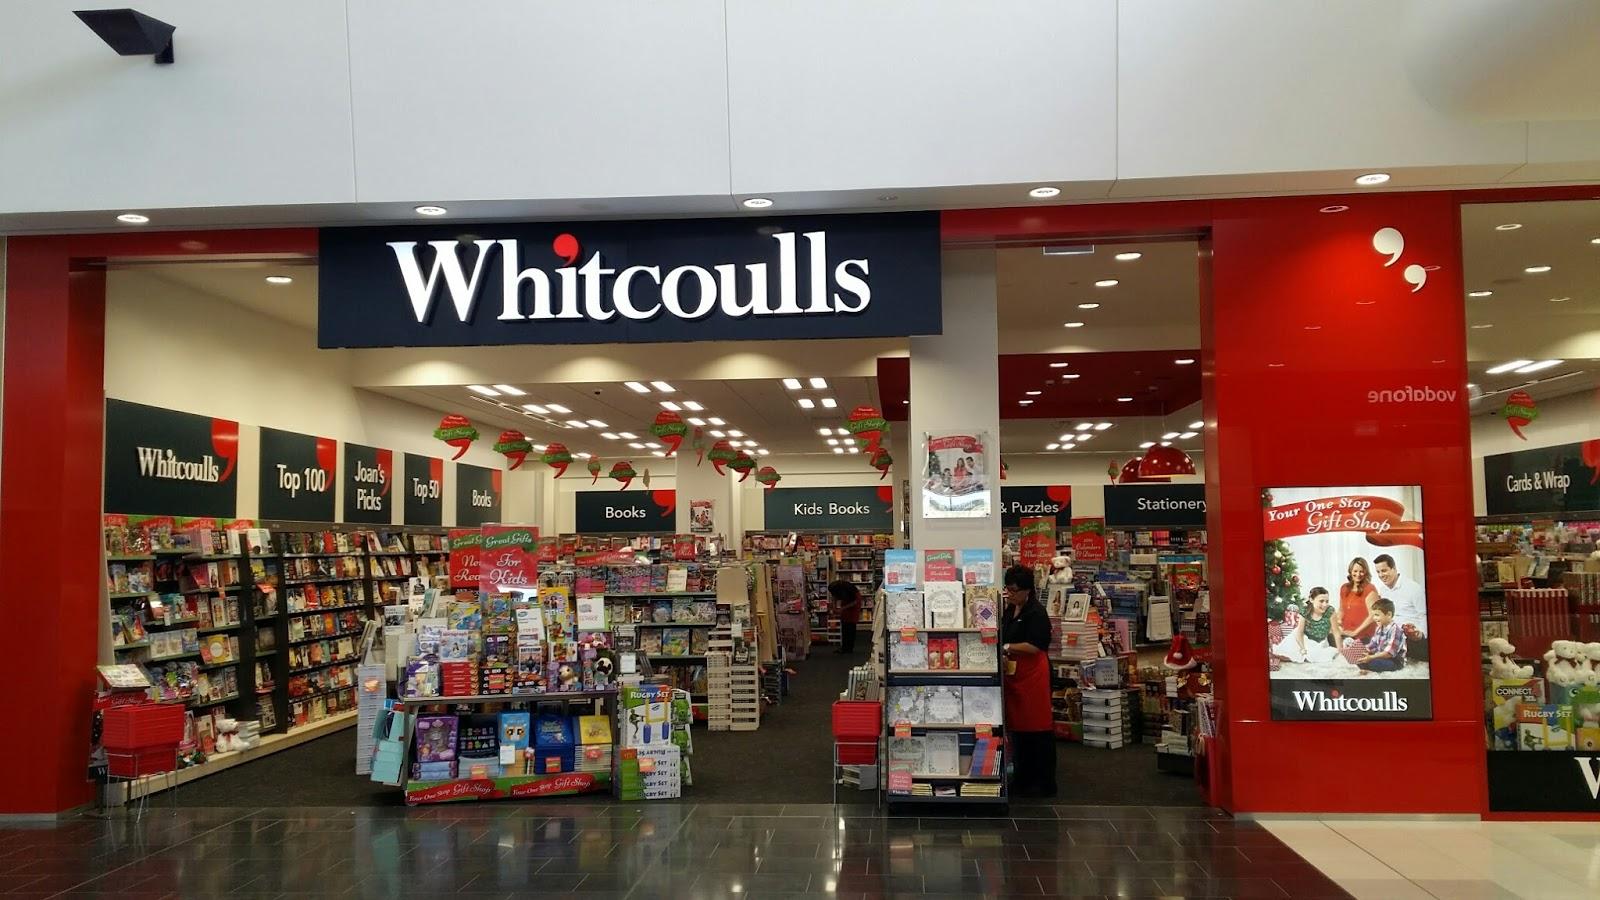 Whitcoulls